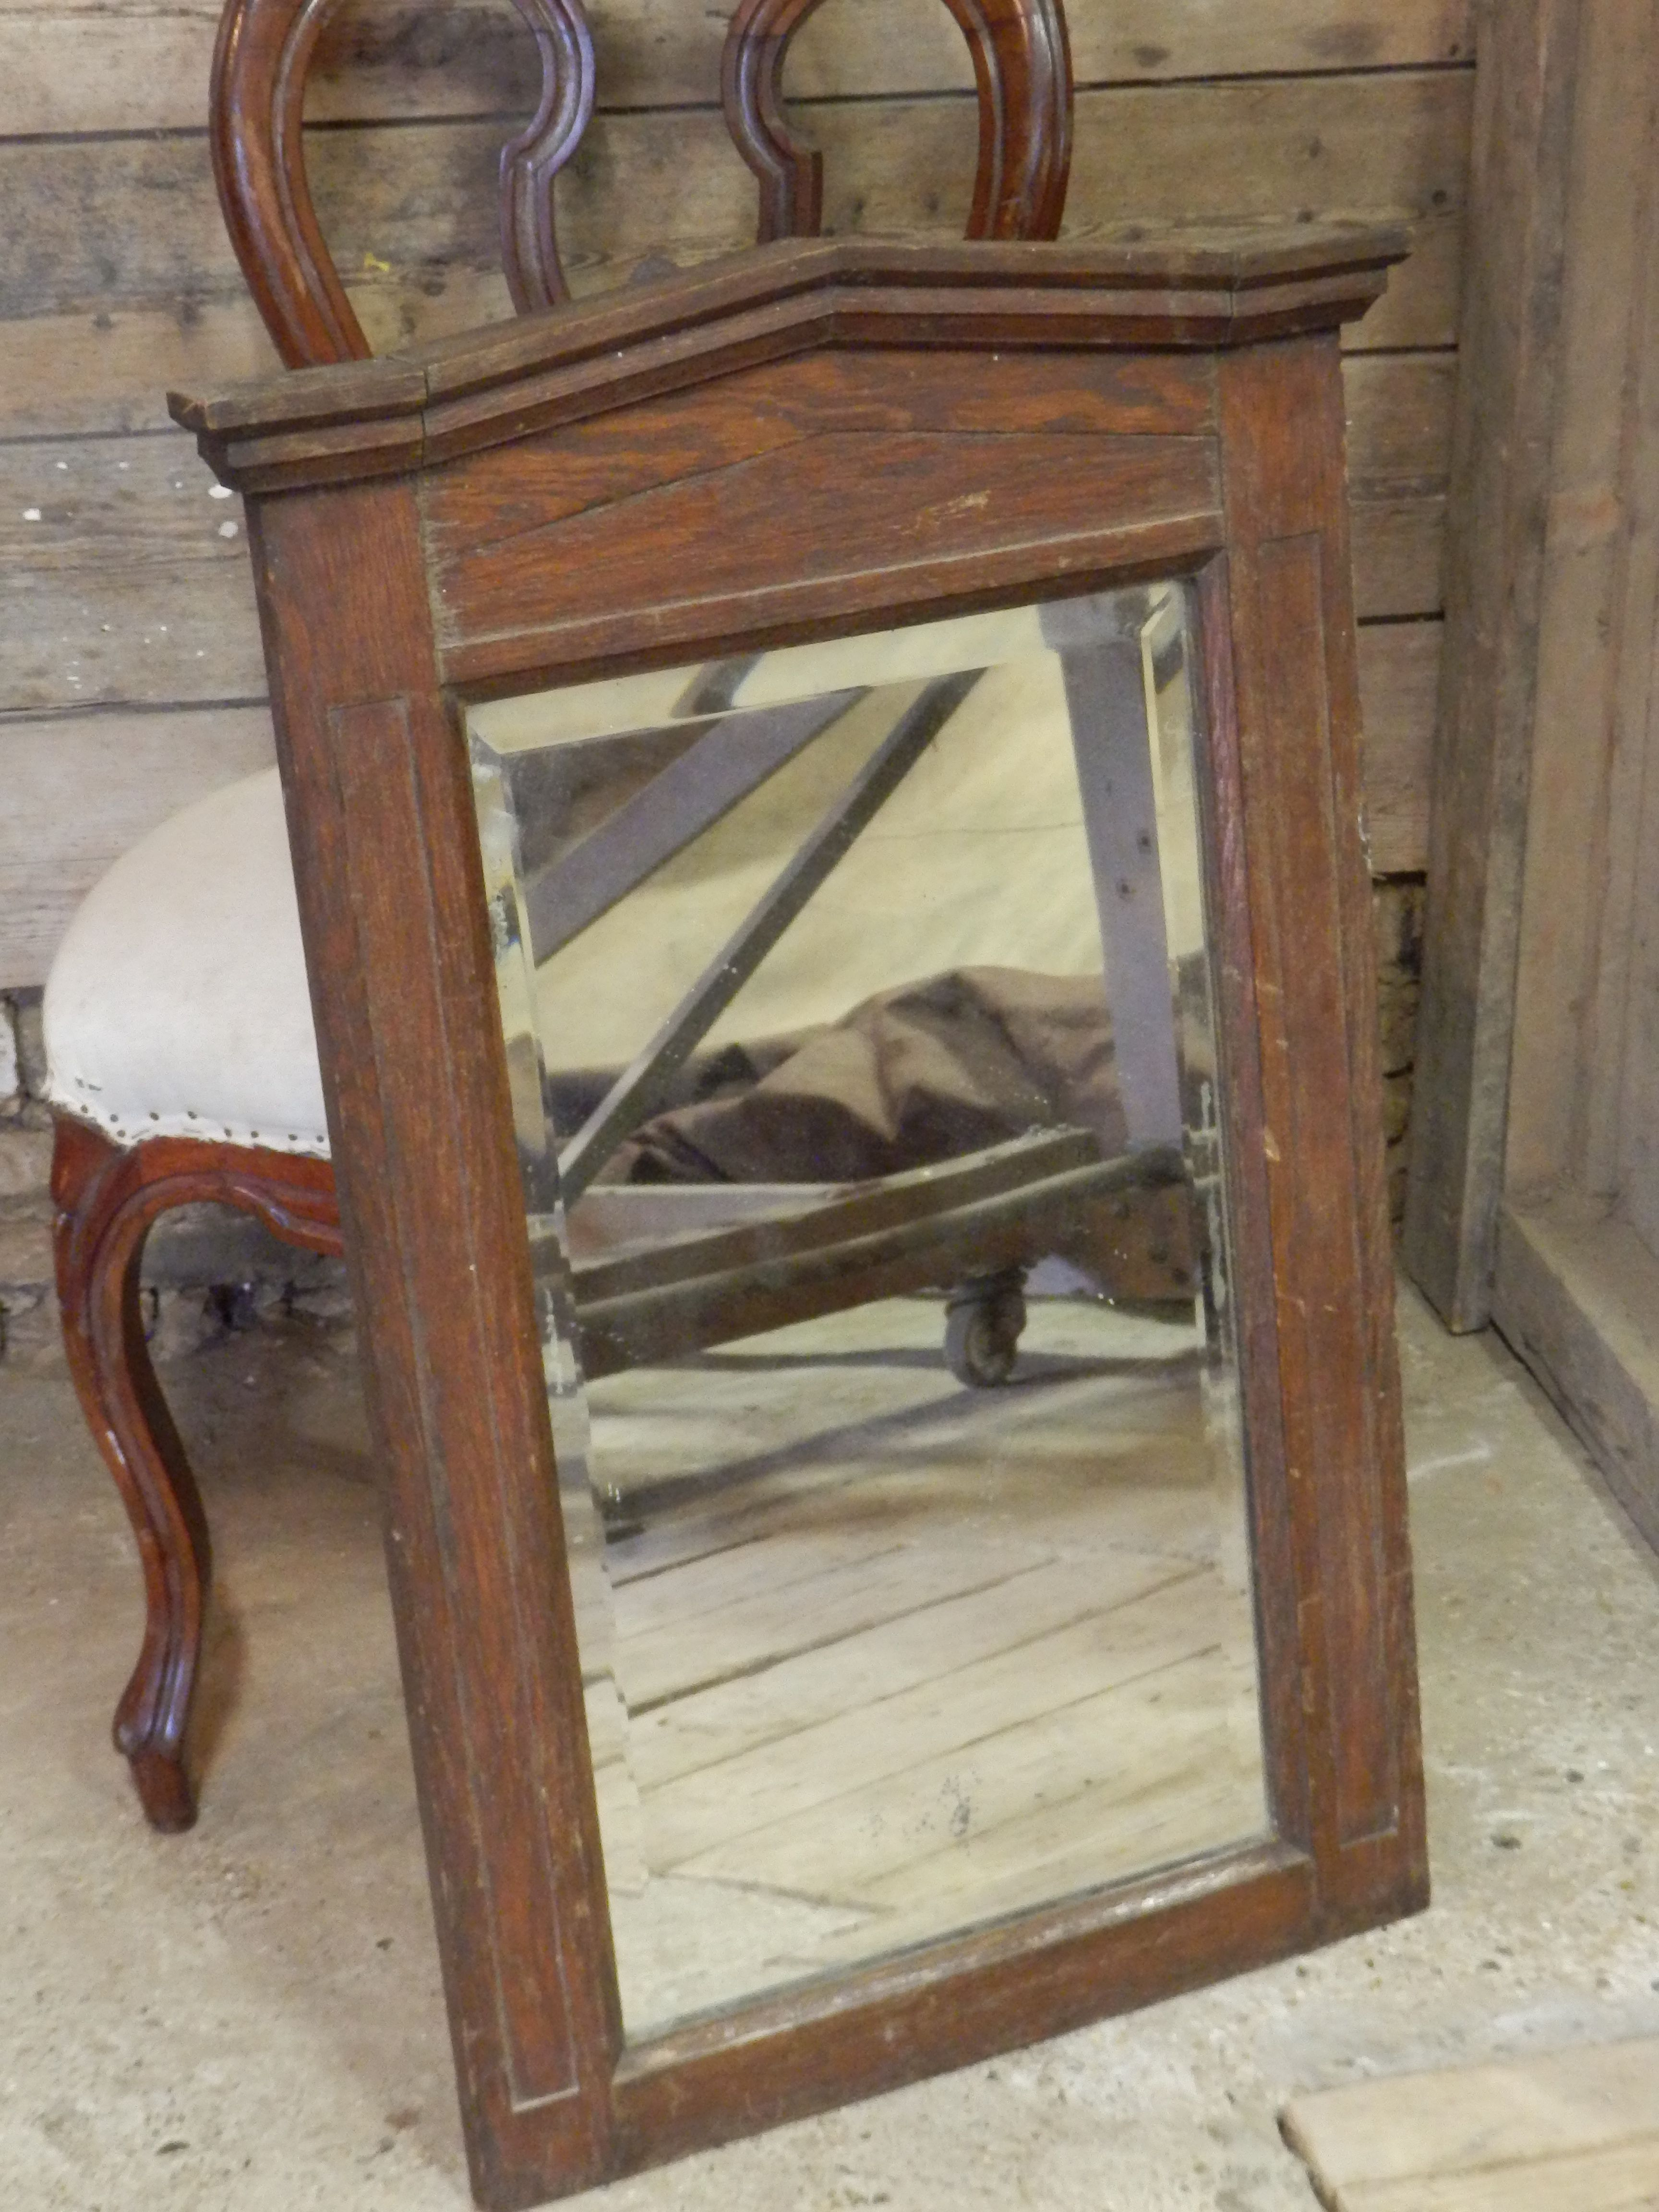 Mooie Grote Houten Spiegel.Verkocht Mooie Grote Houten Spiegel Geslepen Rand In Het